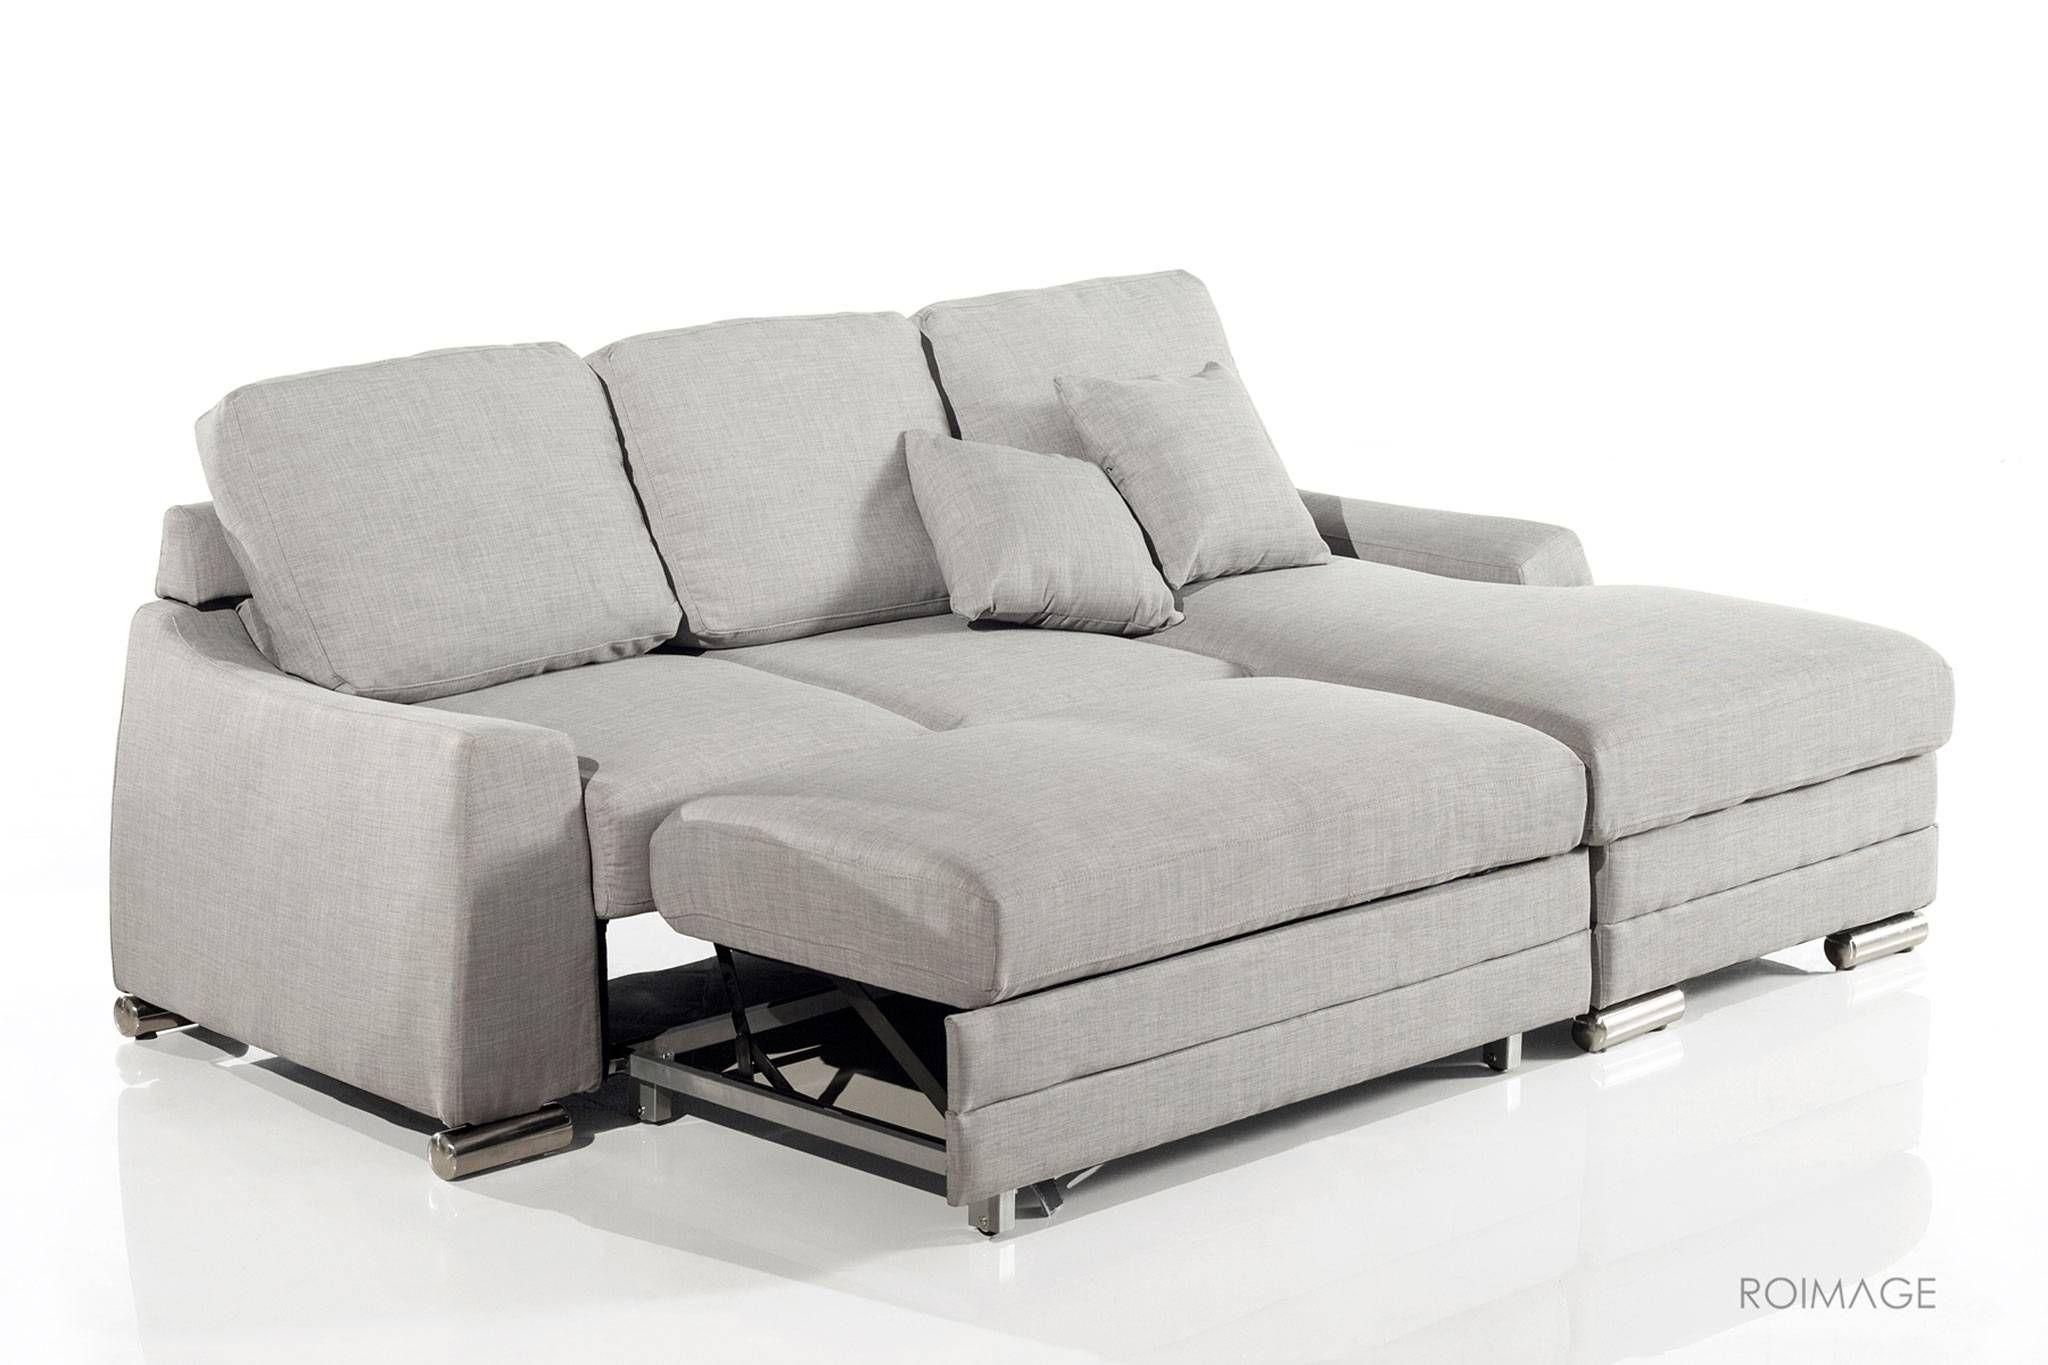 Canape Lit Convertible Pas Cher Canape Convertible 2 Places Haut De Gamme In 2020 Furniture Transforming Furniture Cool Furniture